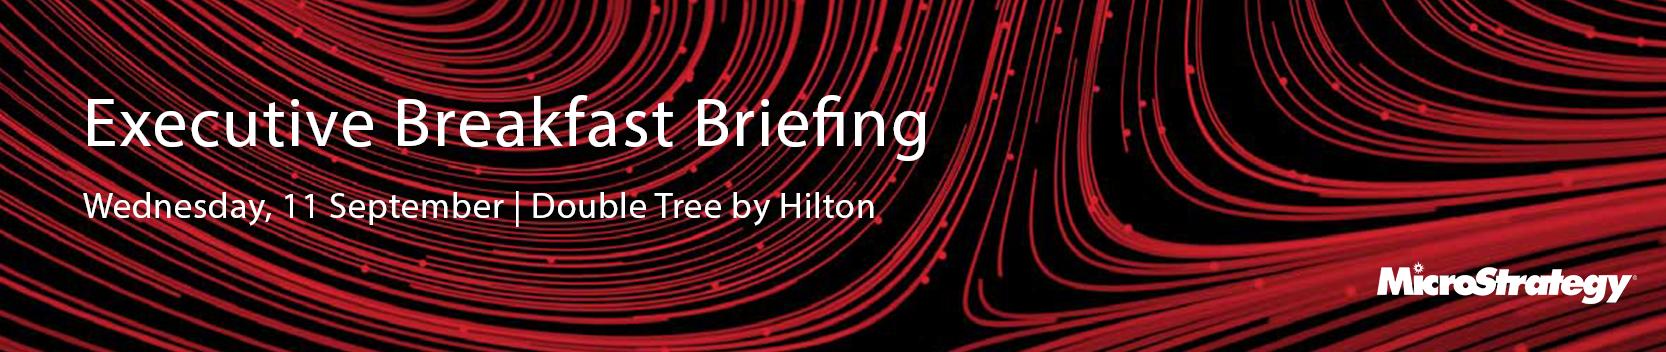 Executive Breakfast Briefing - Melbourne